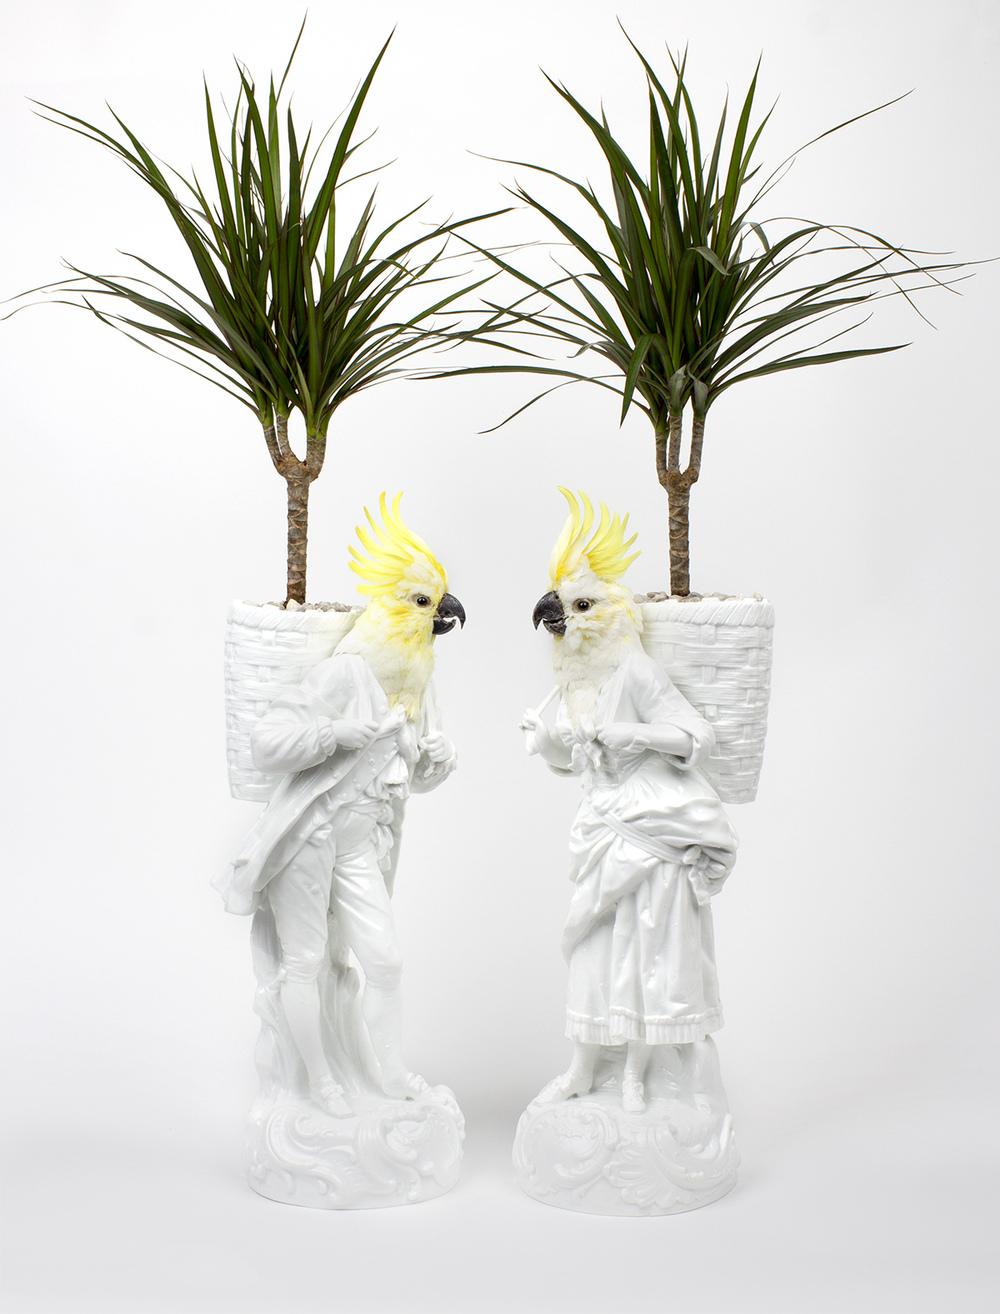 Les-deux-Garcons-palmbirds.jpg